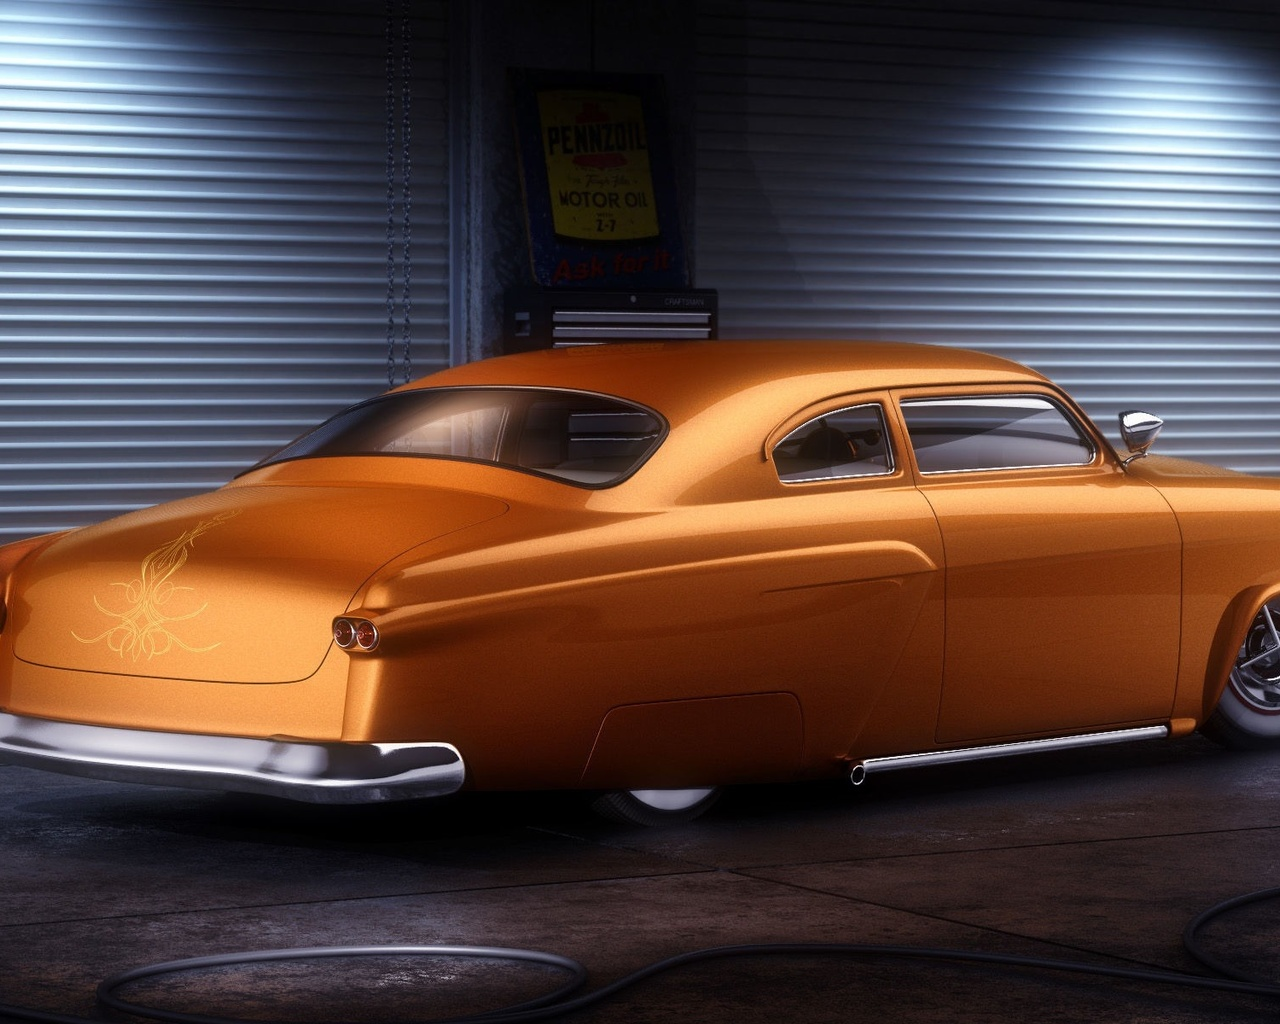 american, classic, car, custom